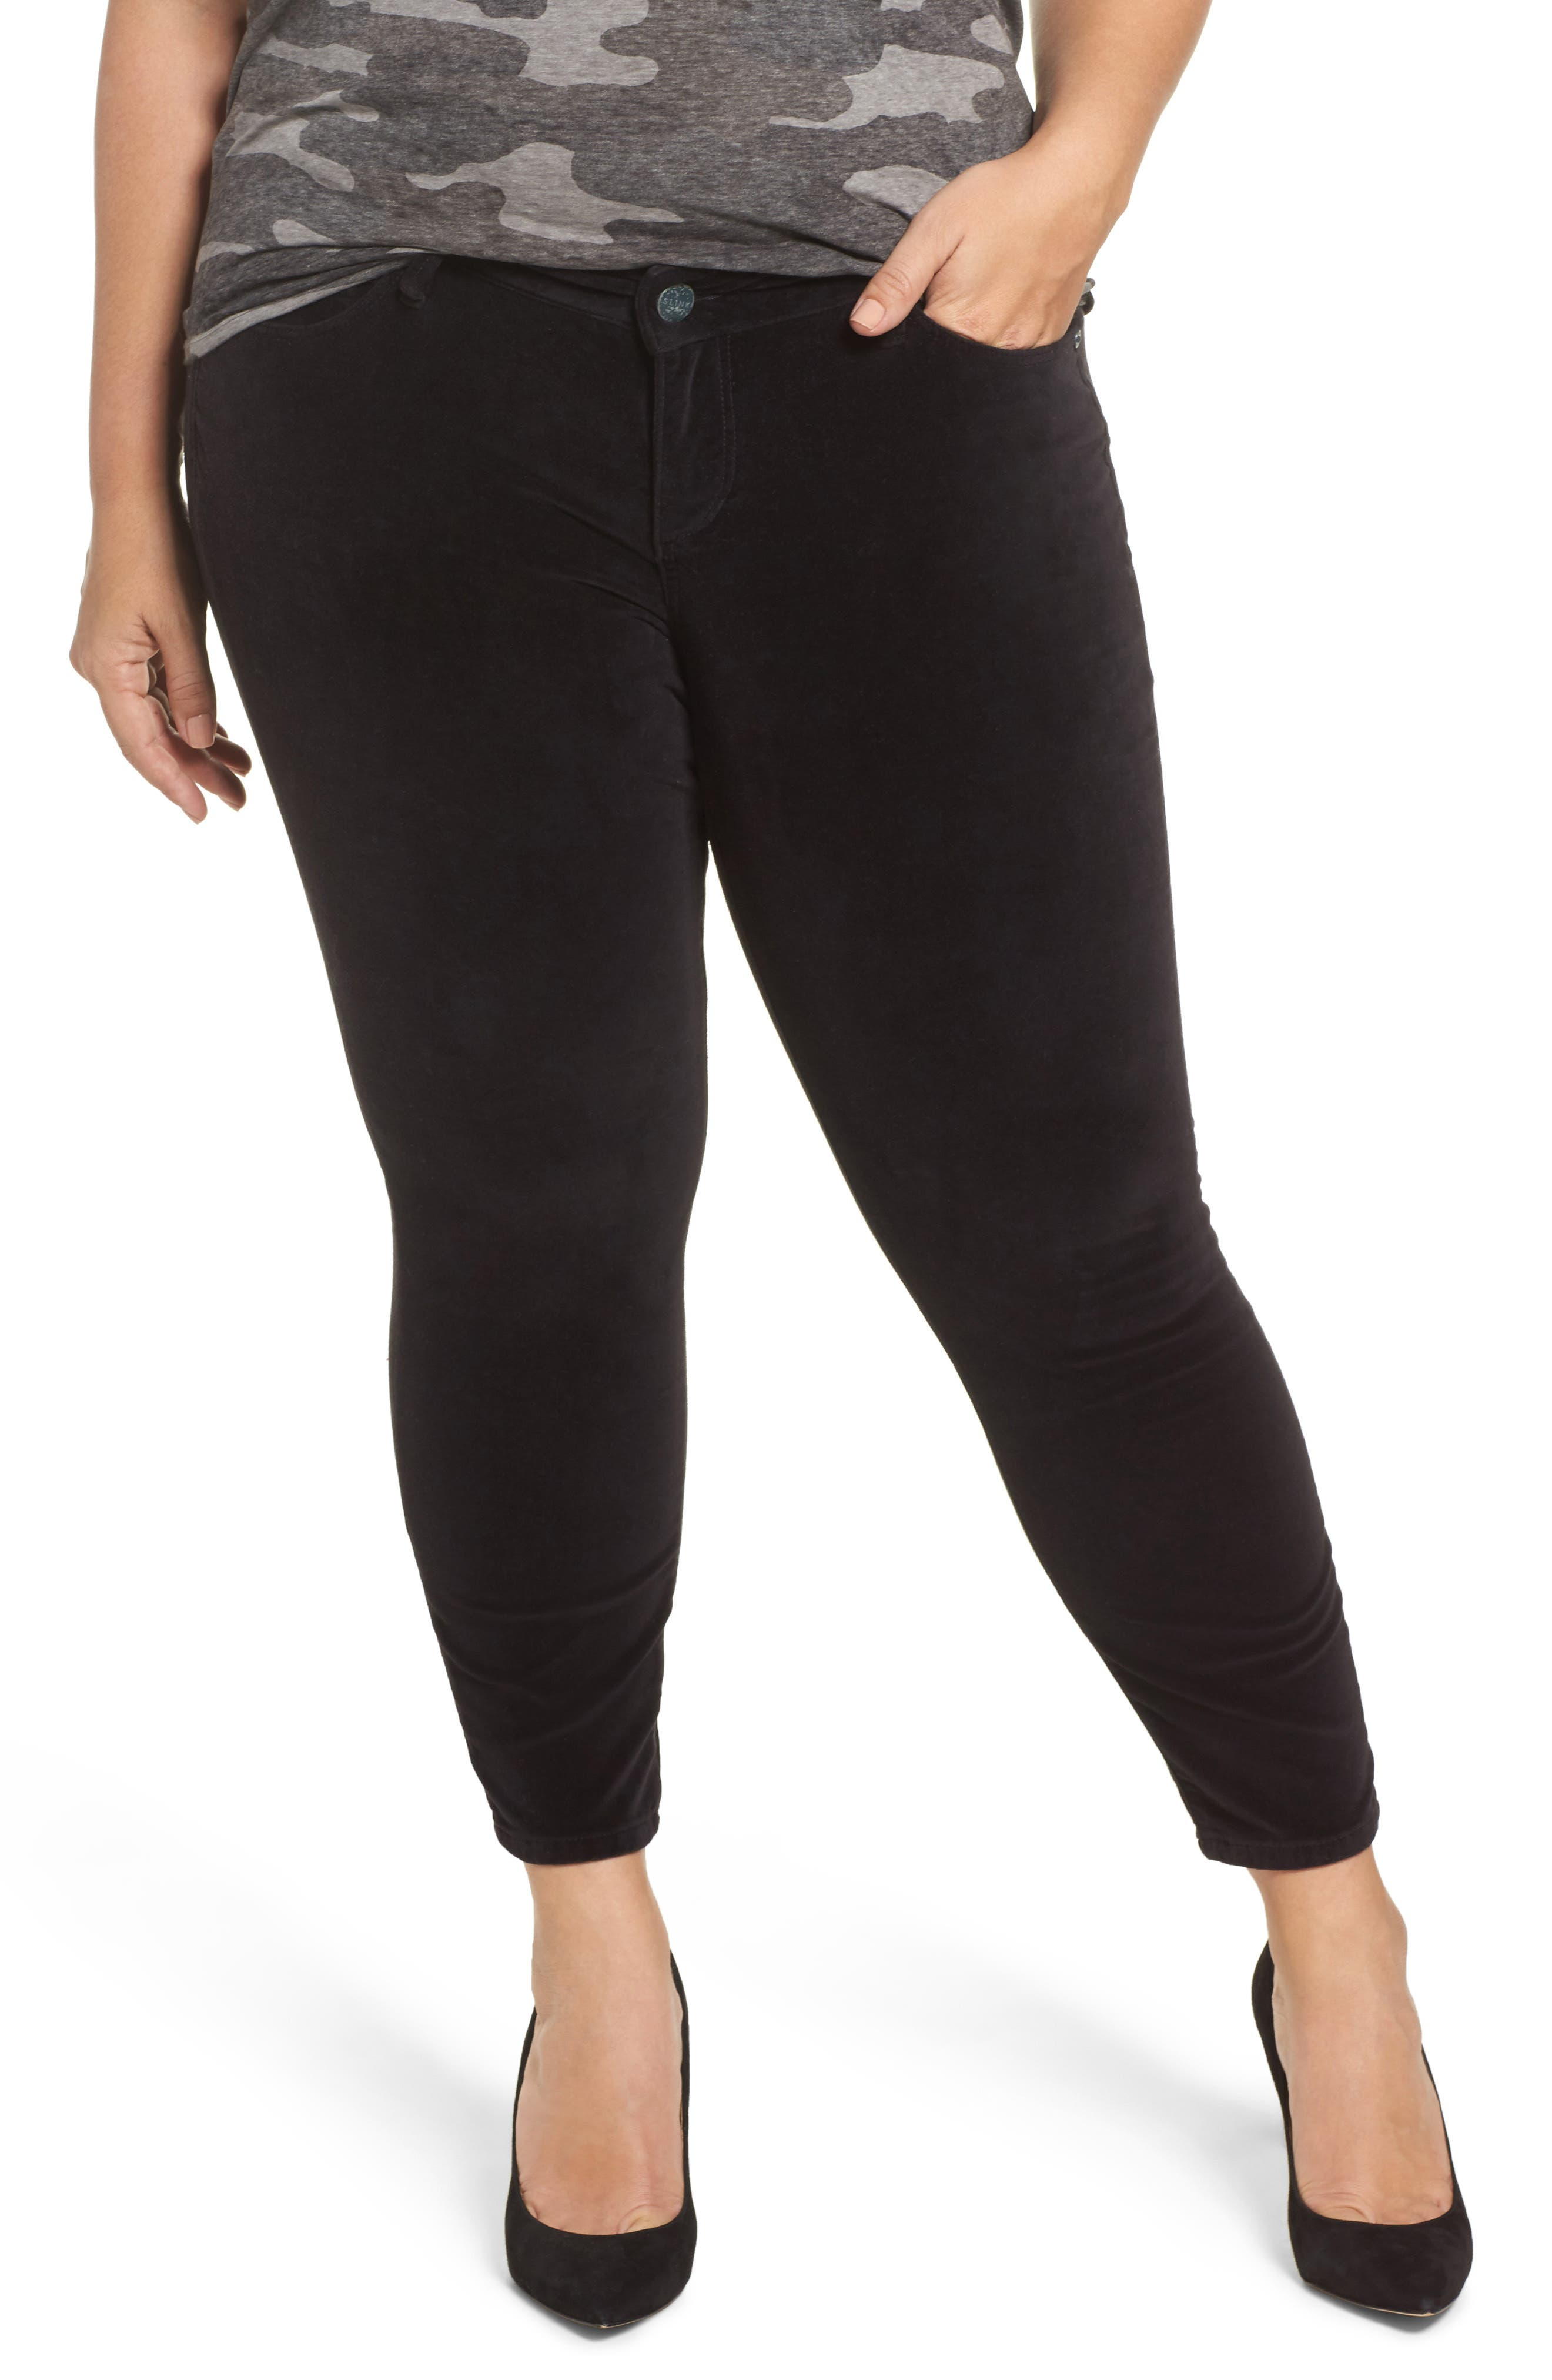 Alternate Image 1 Selected - SLINK Jeans Velvet Skinny Ankle Jeans (Plus Size)